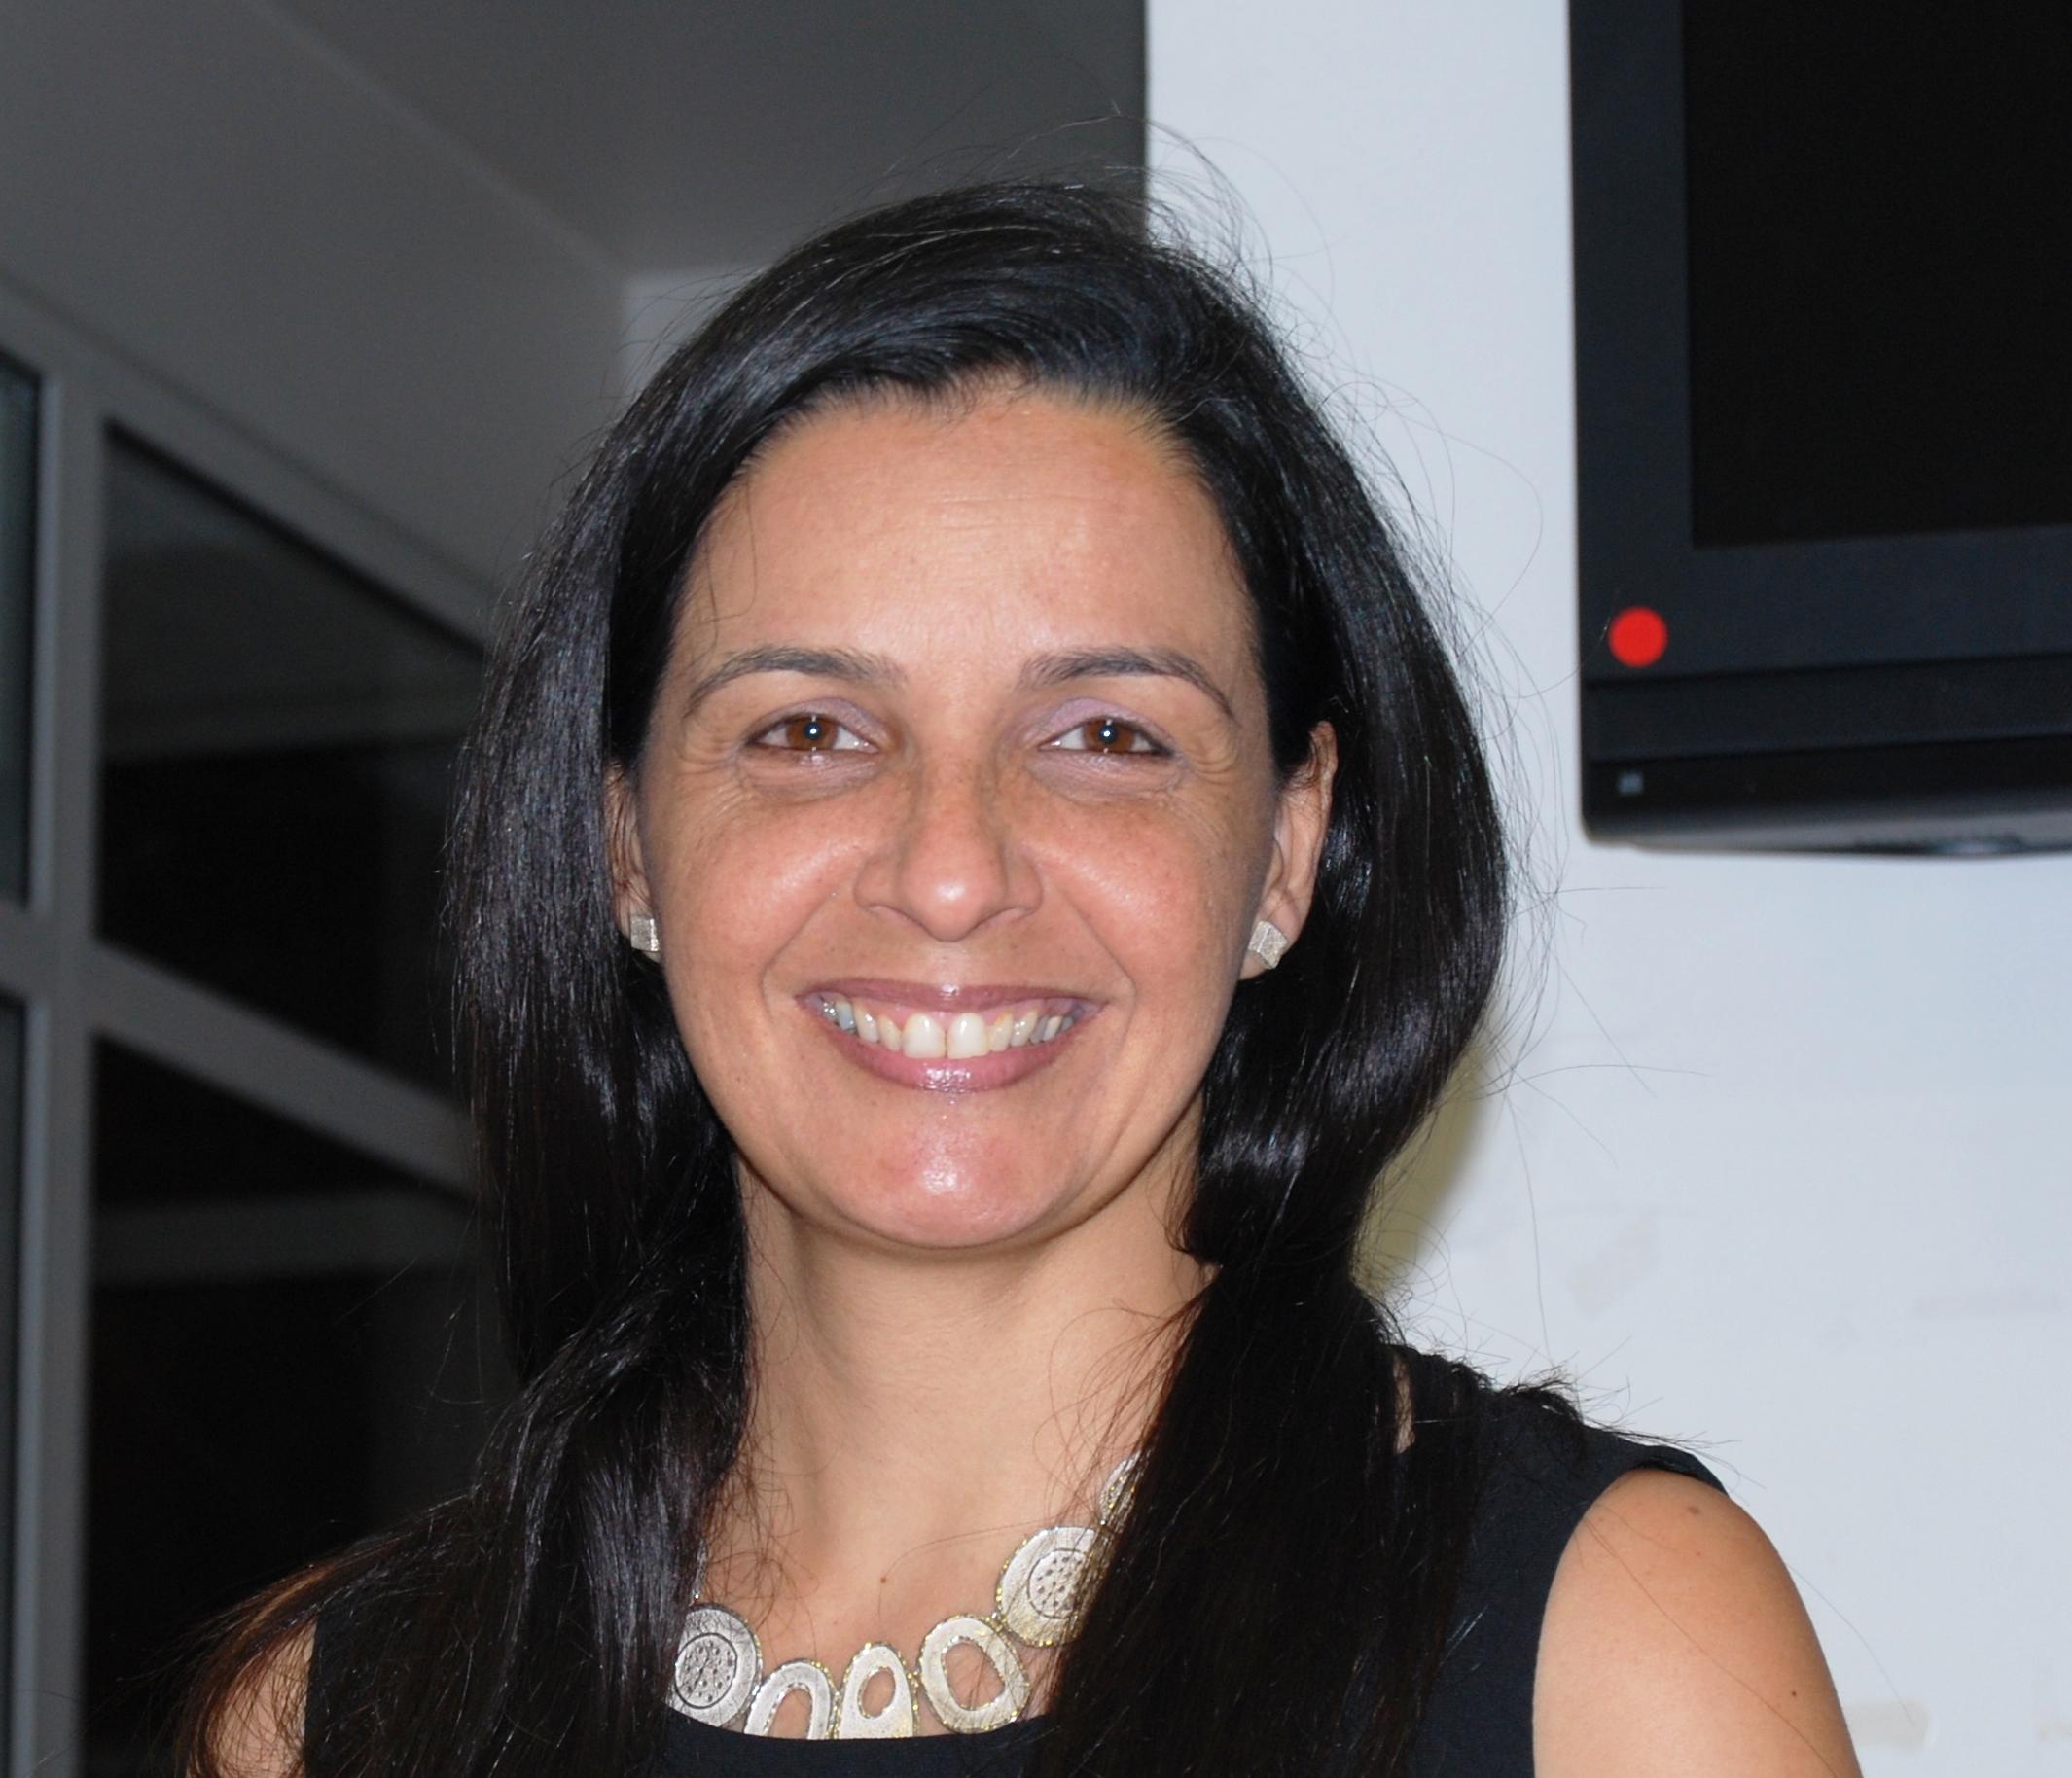 Dr. Granit Almog-Bareket